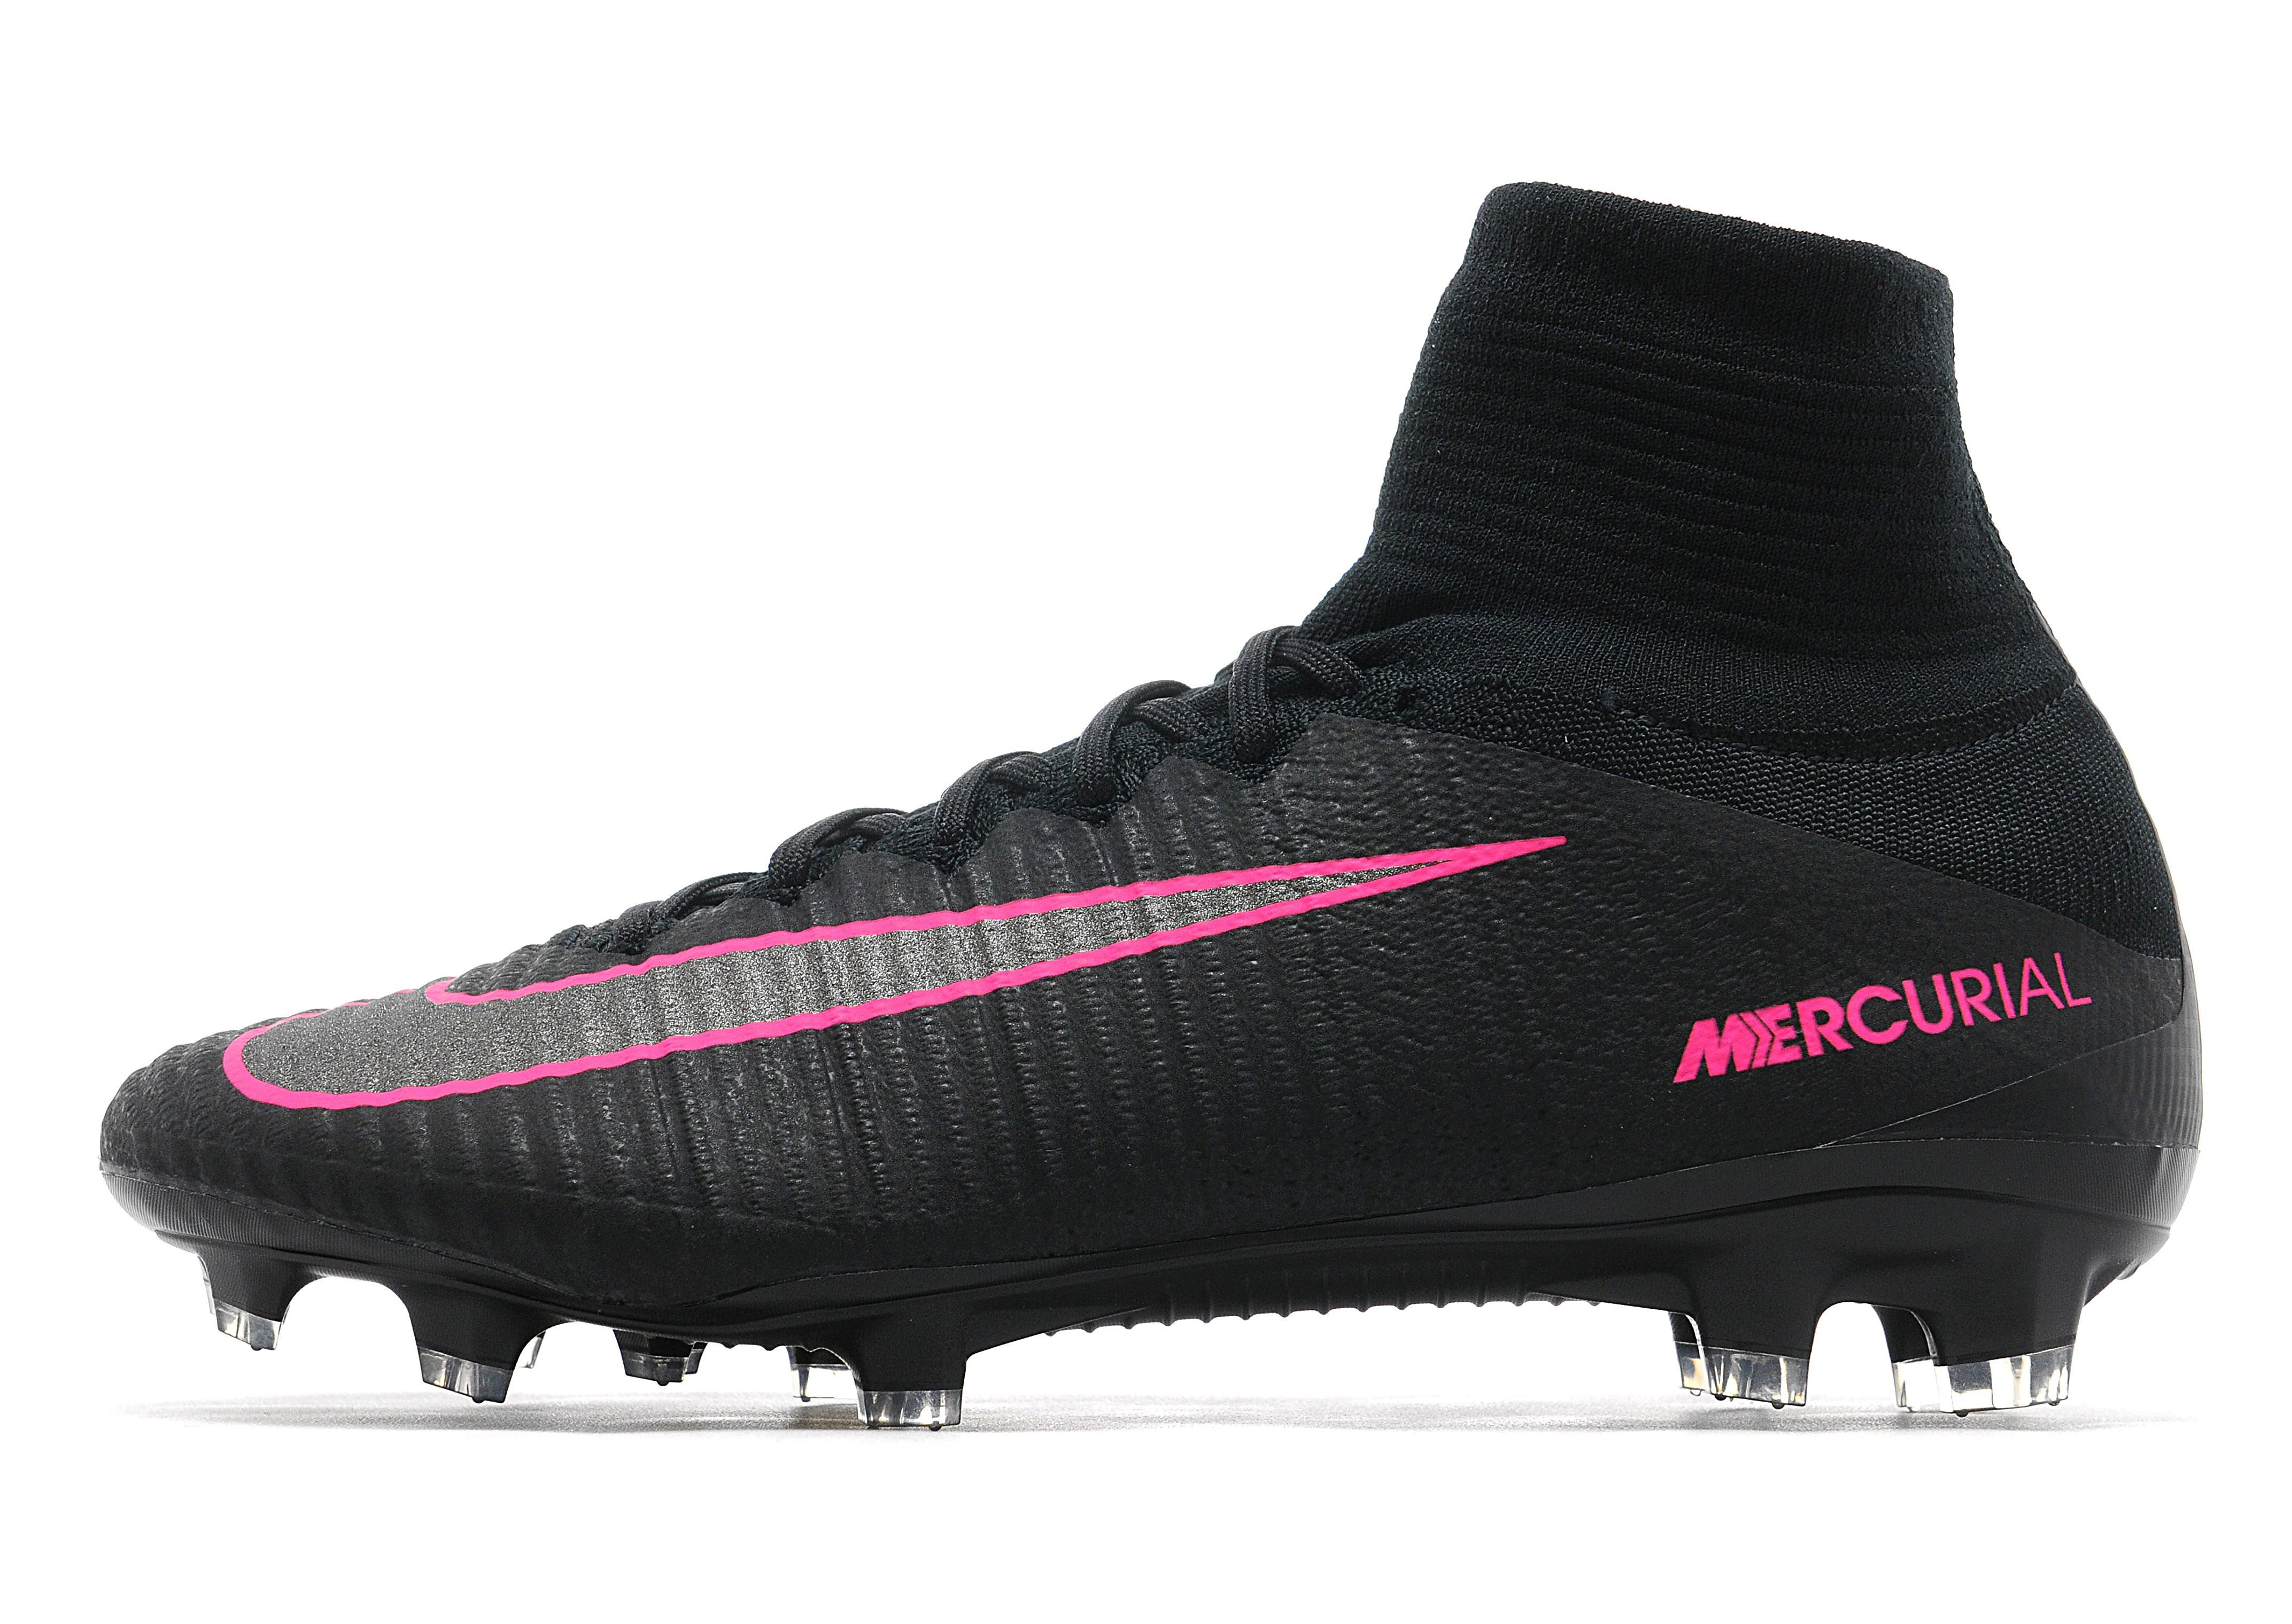 Nike Pitch Dark Mercurial Superfly V FG